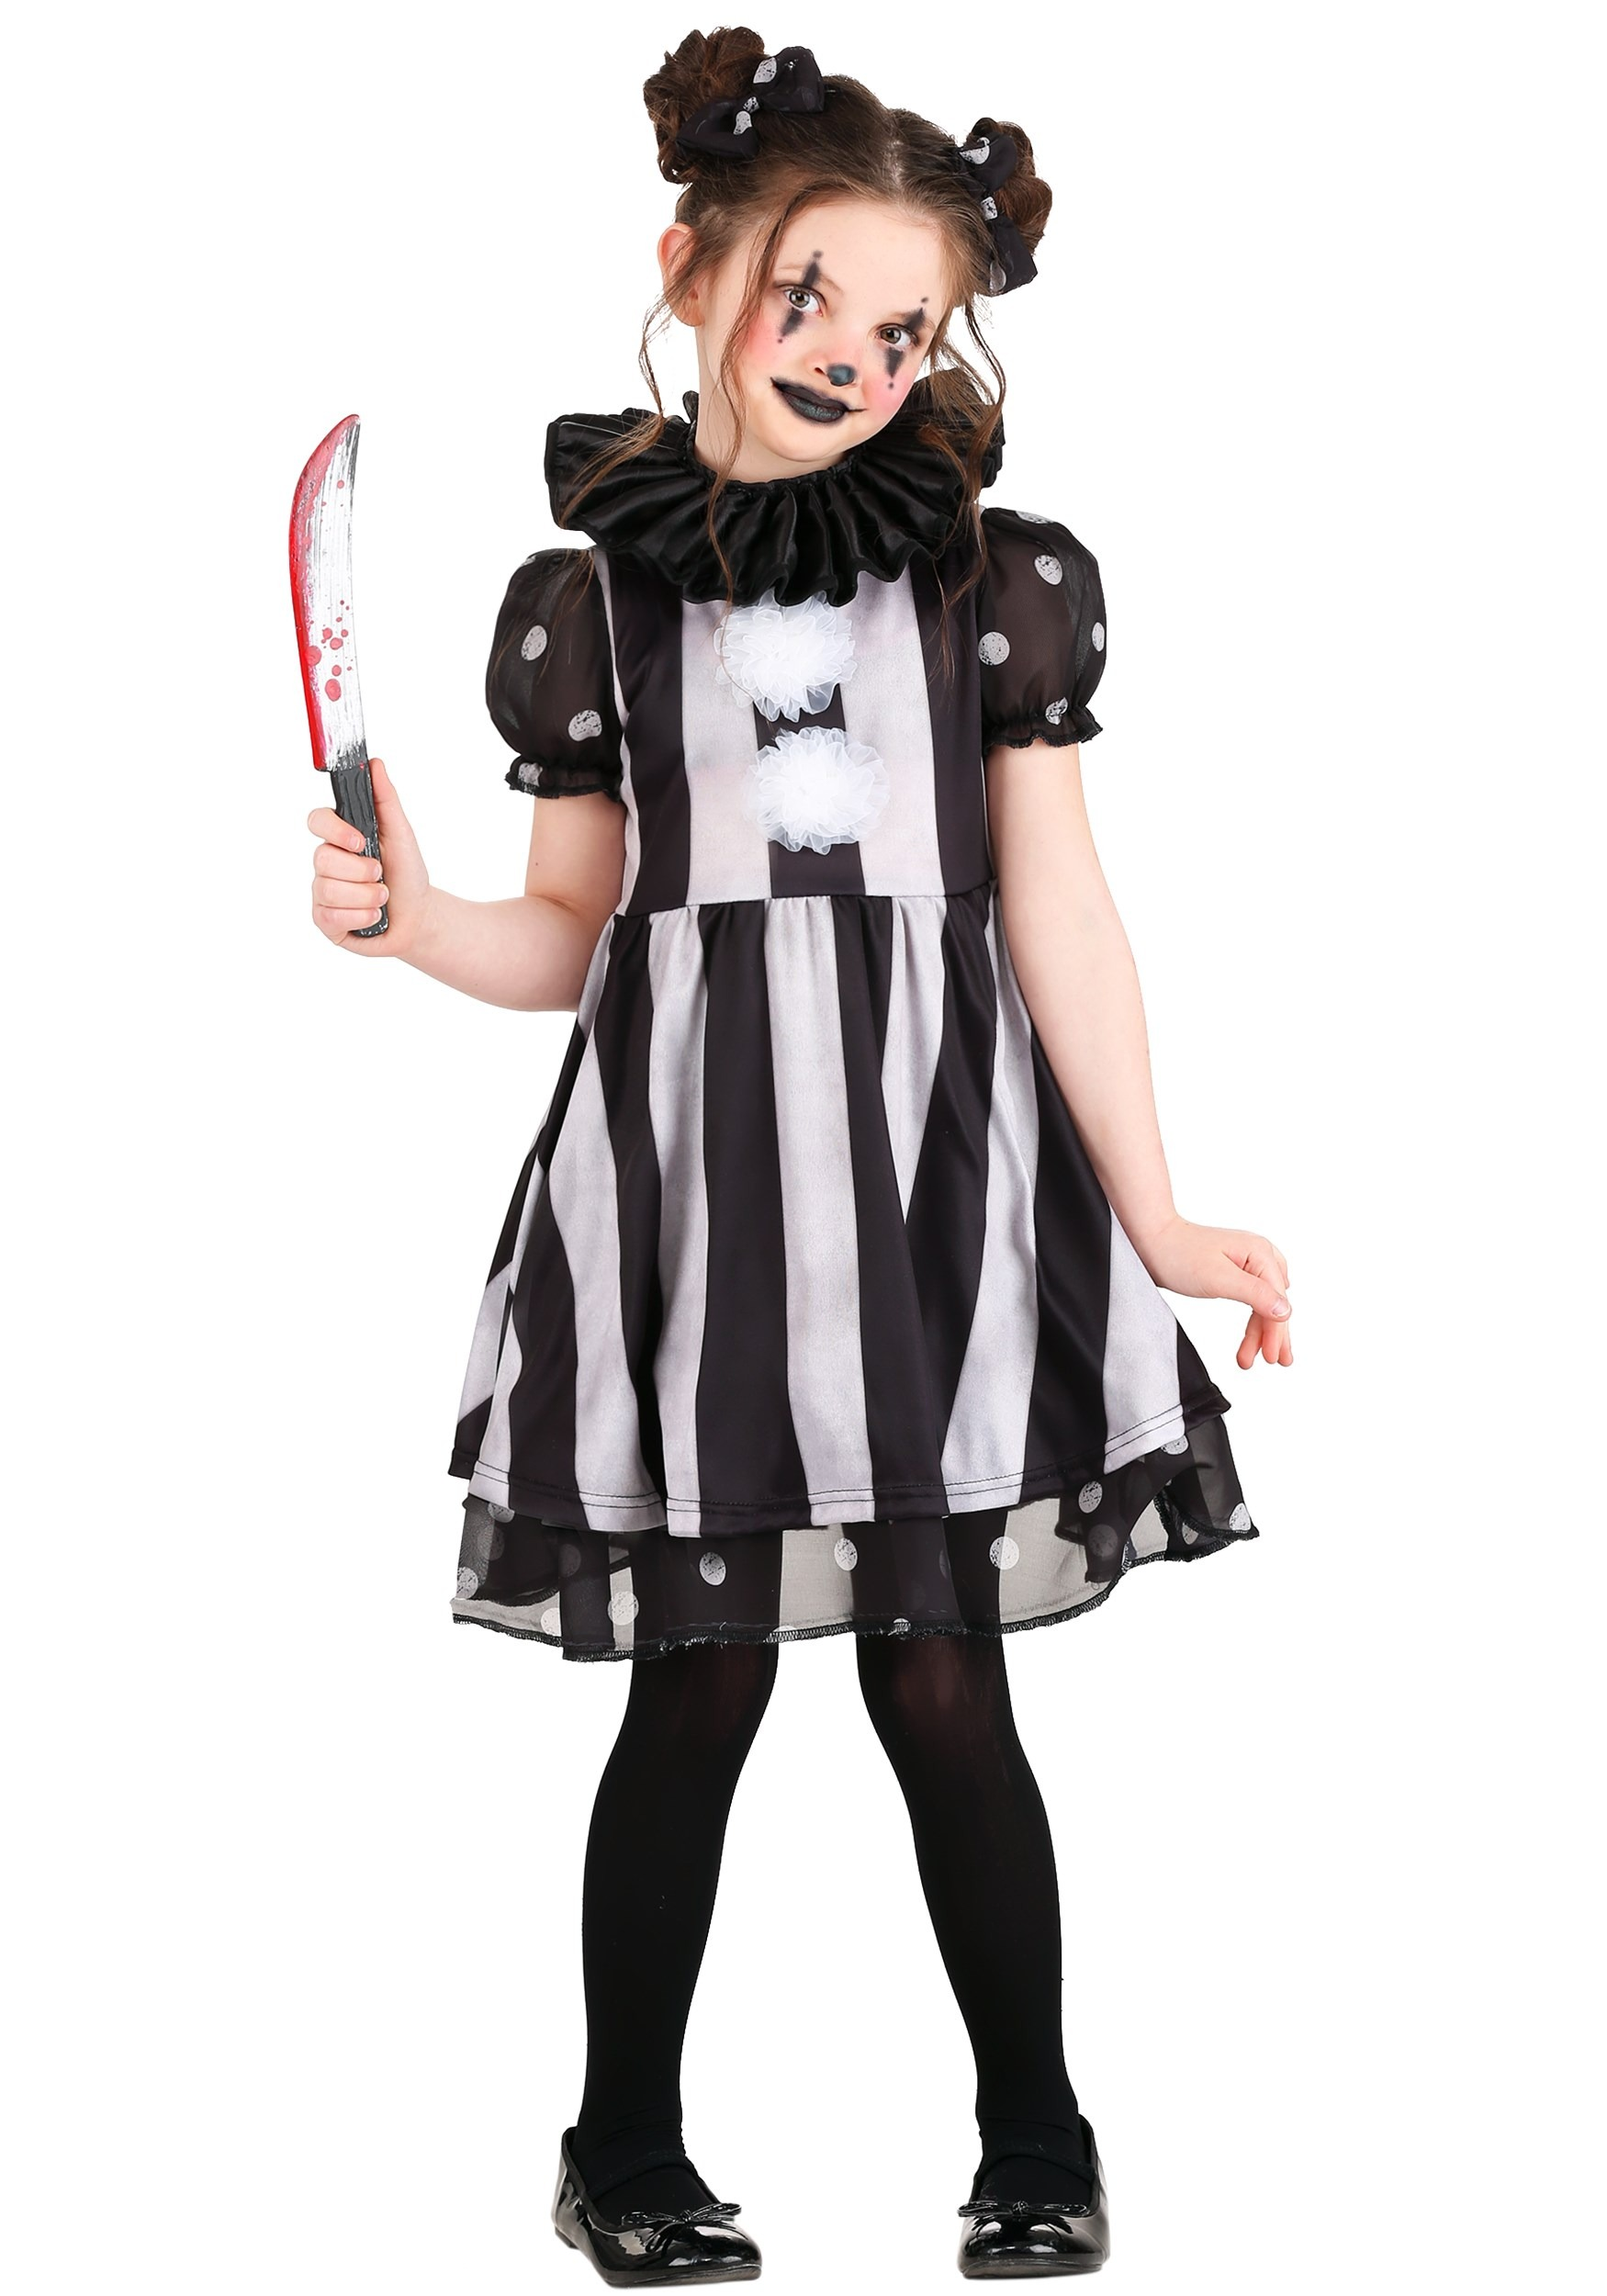 Clown Halloween Costumes For Girls.Dark Circus Clown Costume For Girls